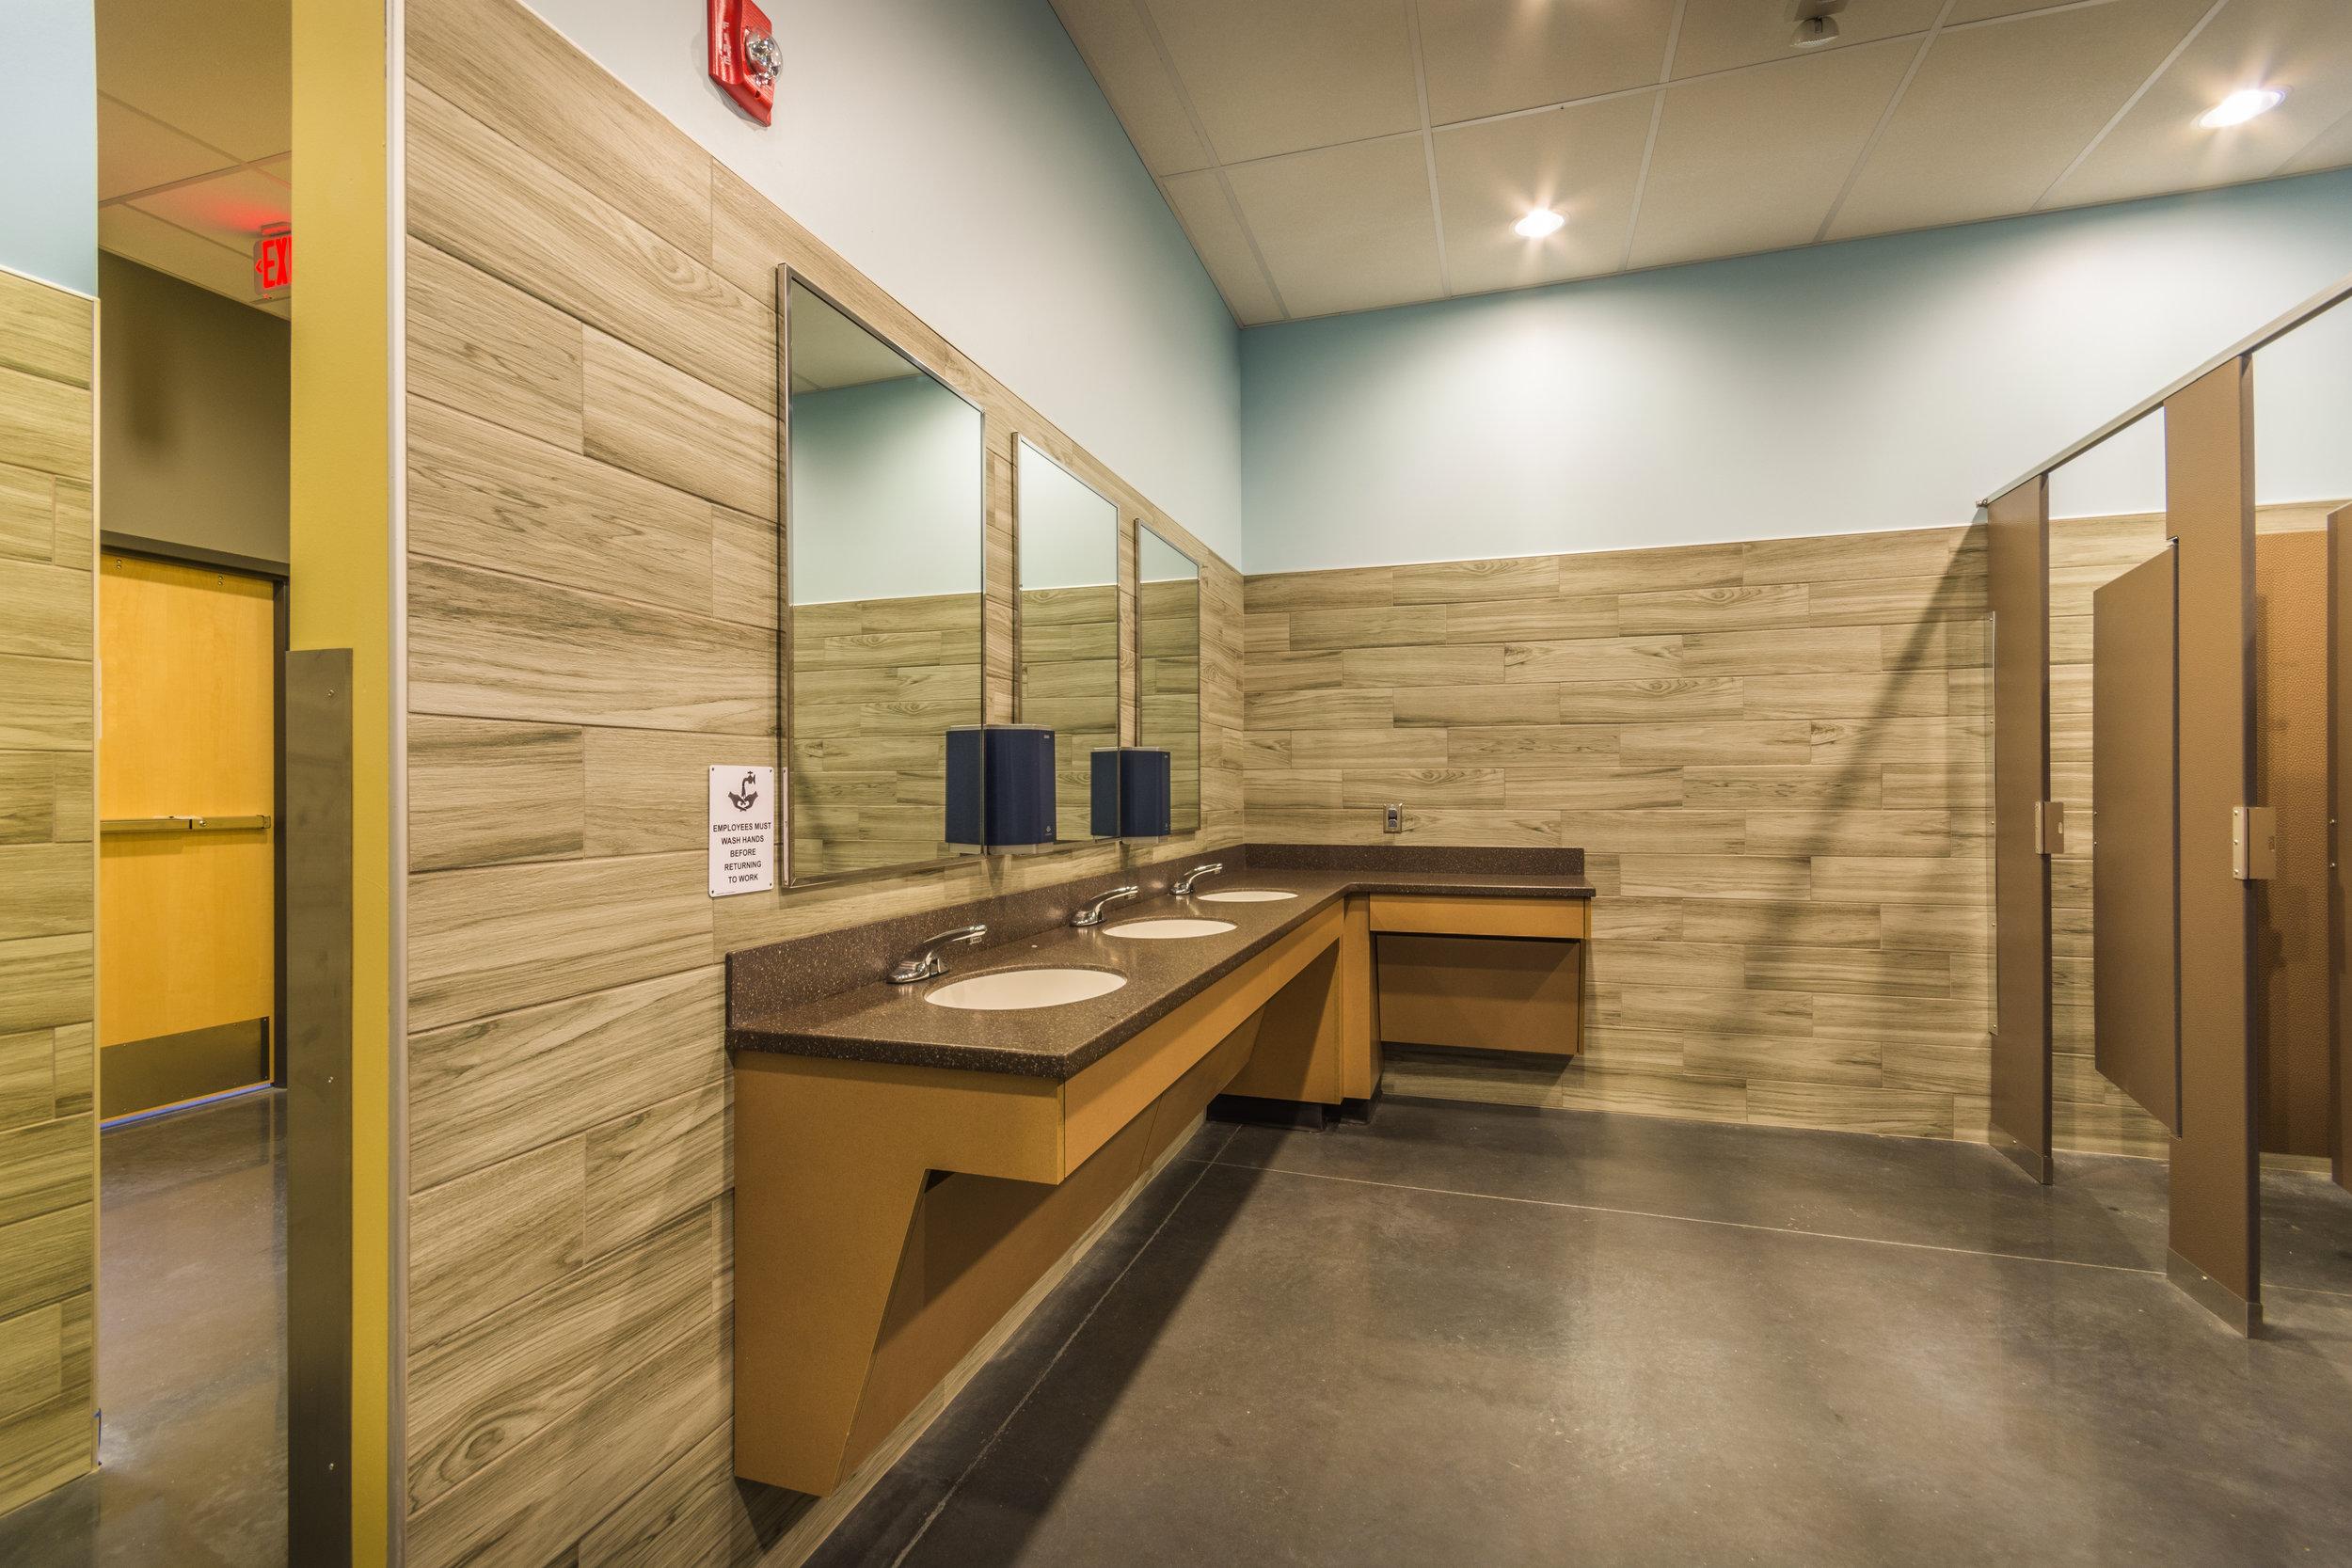 Widgets_Restroom4.jpg